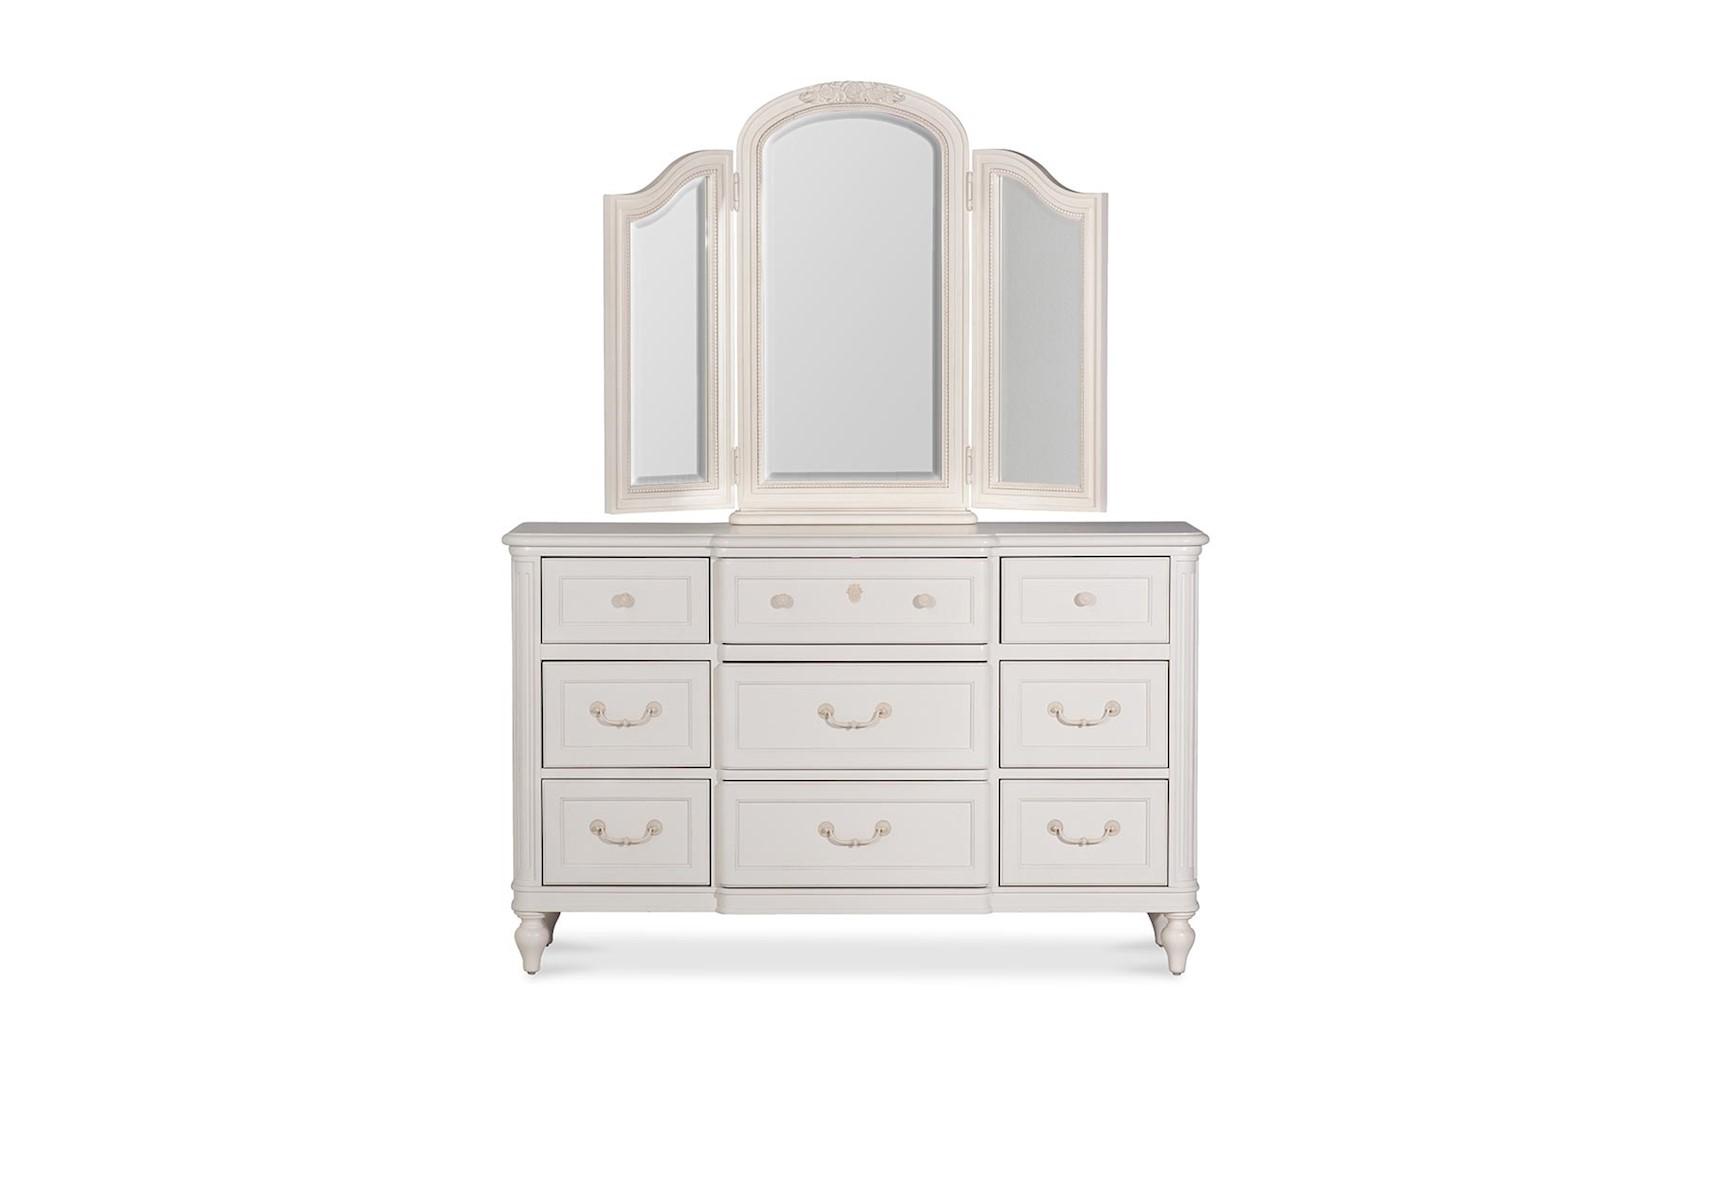 Lacks Gabriella 9 Drawer Dresser And Mirror